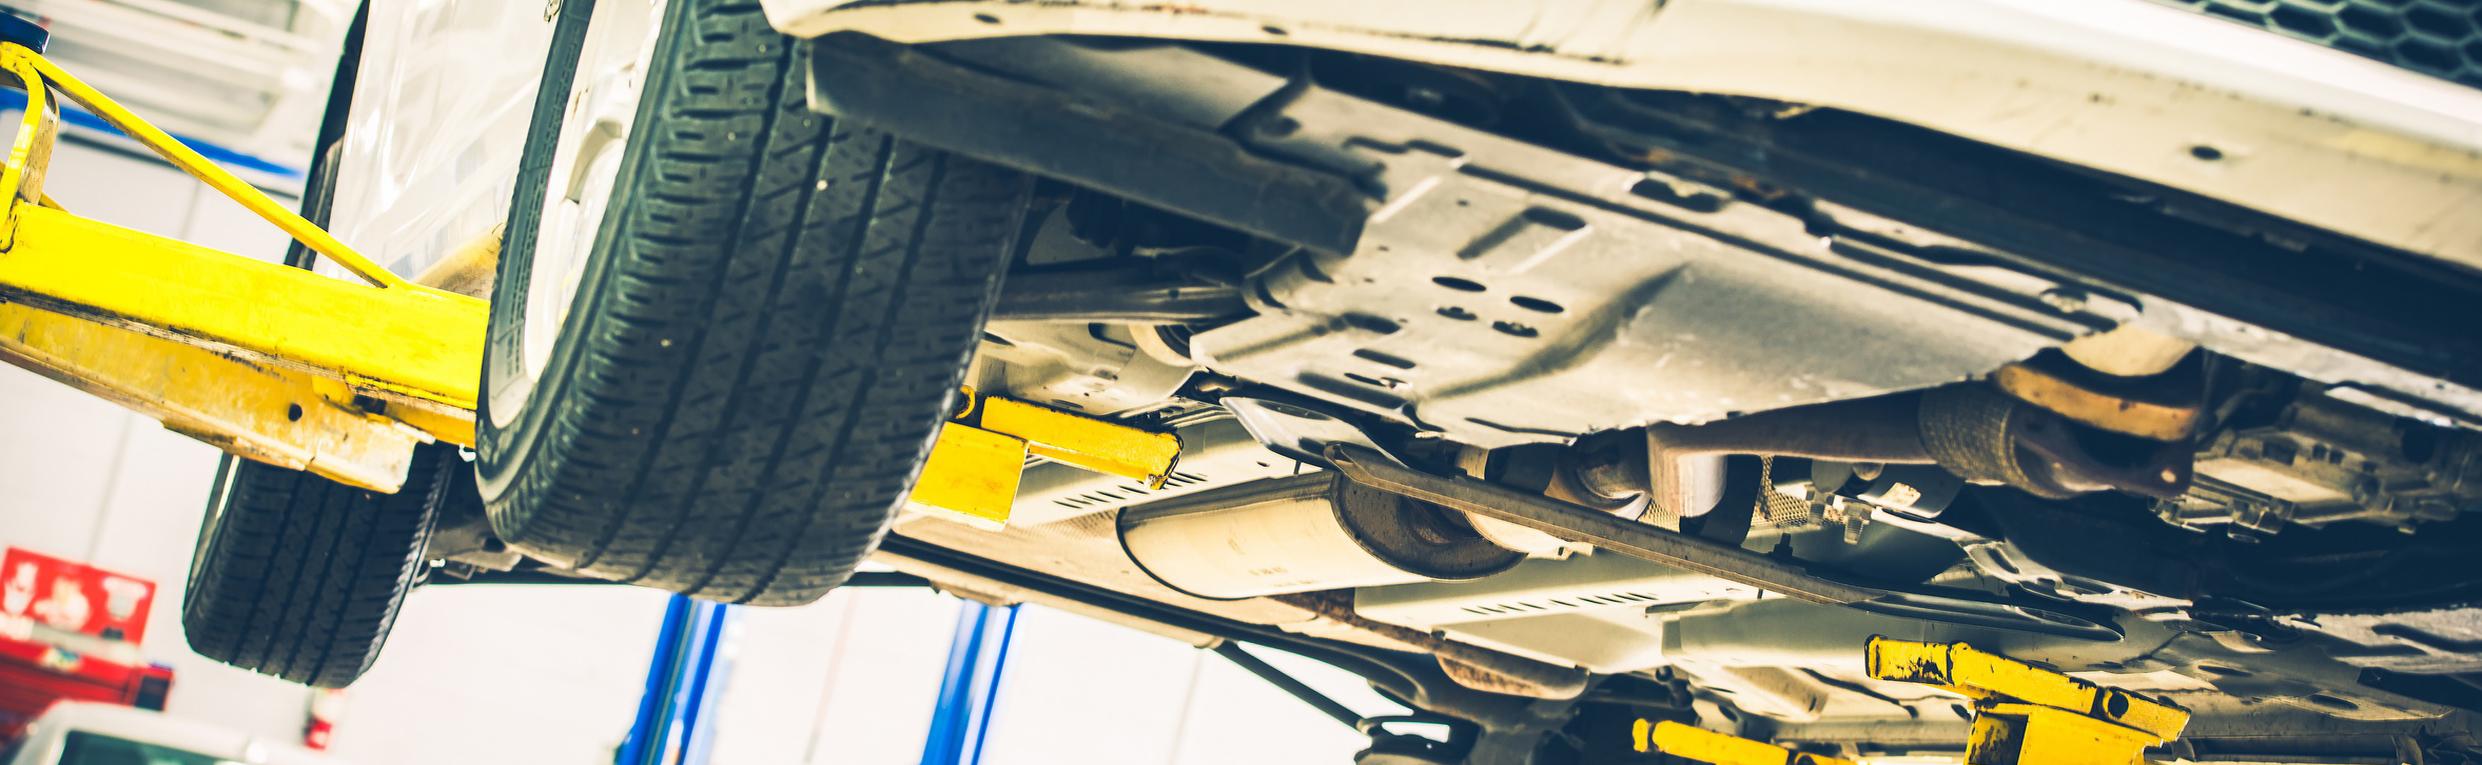 Close-up of car mechanic fixing automotive engine